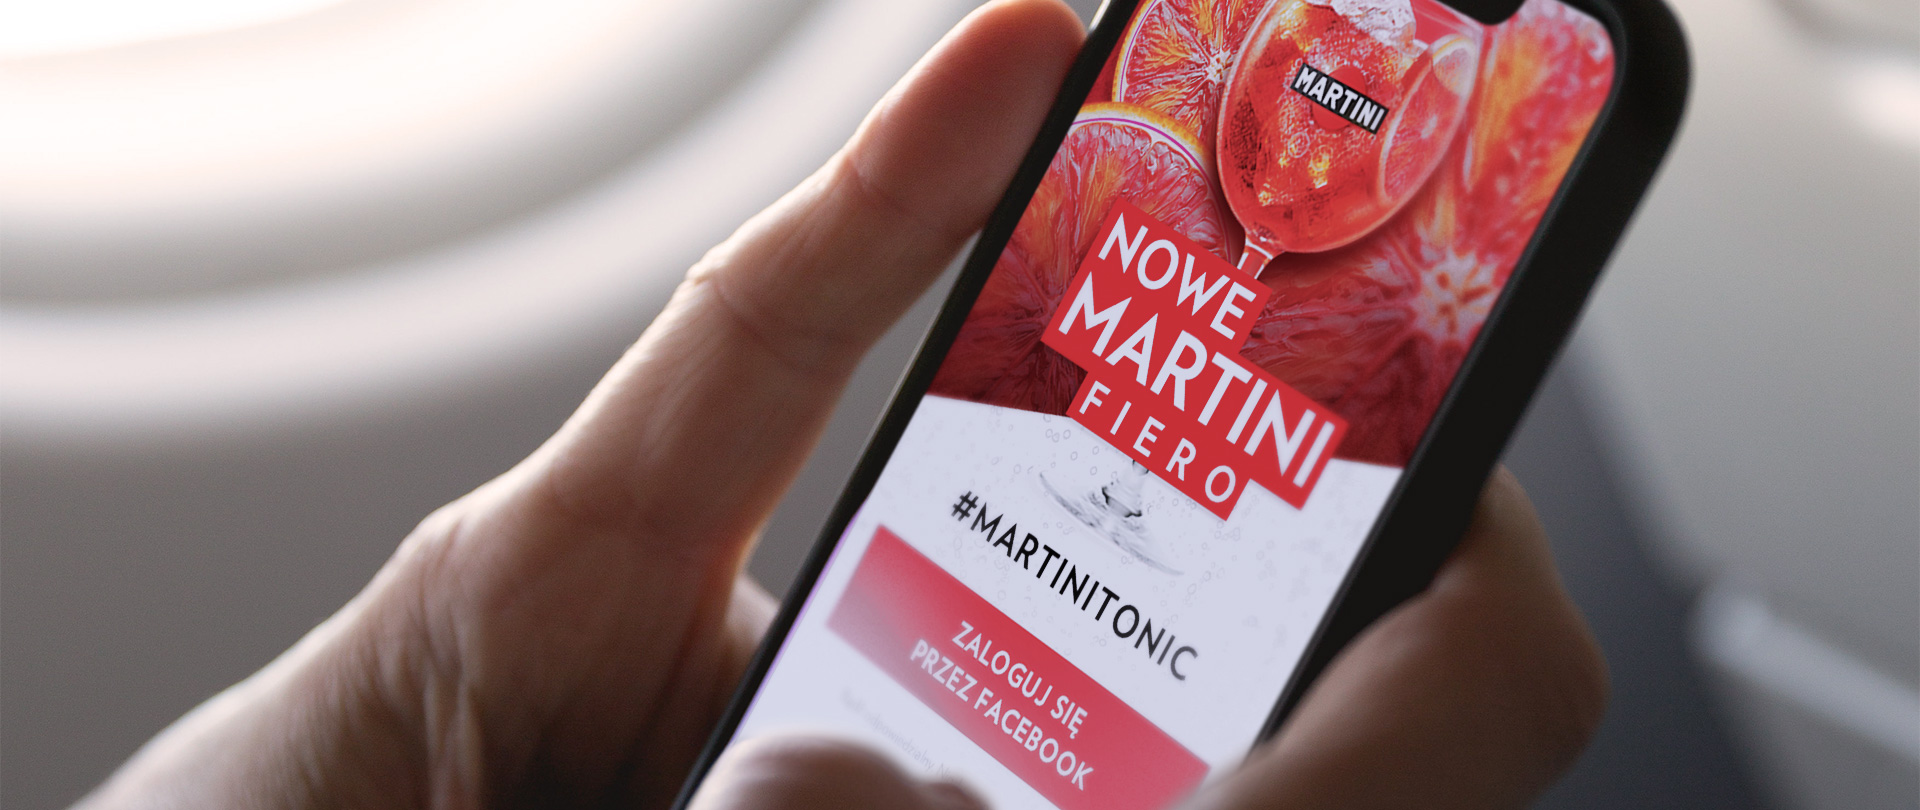 Martini Fiero Tonic app